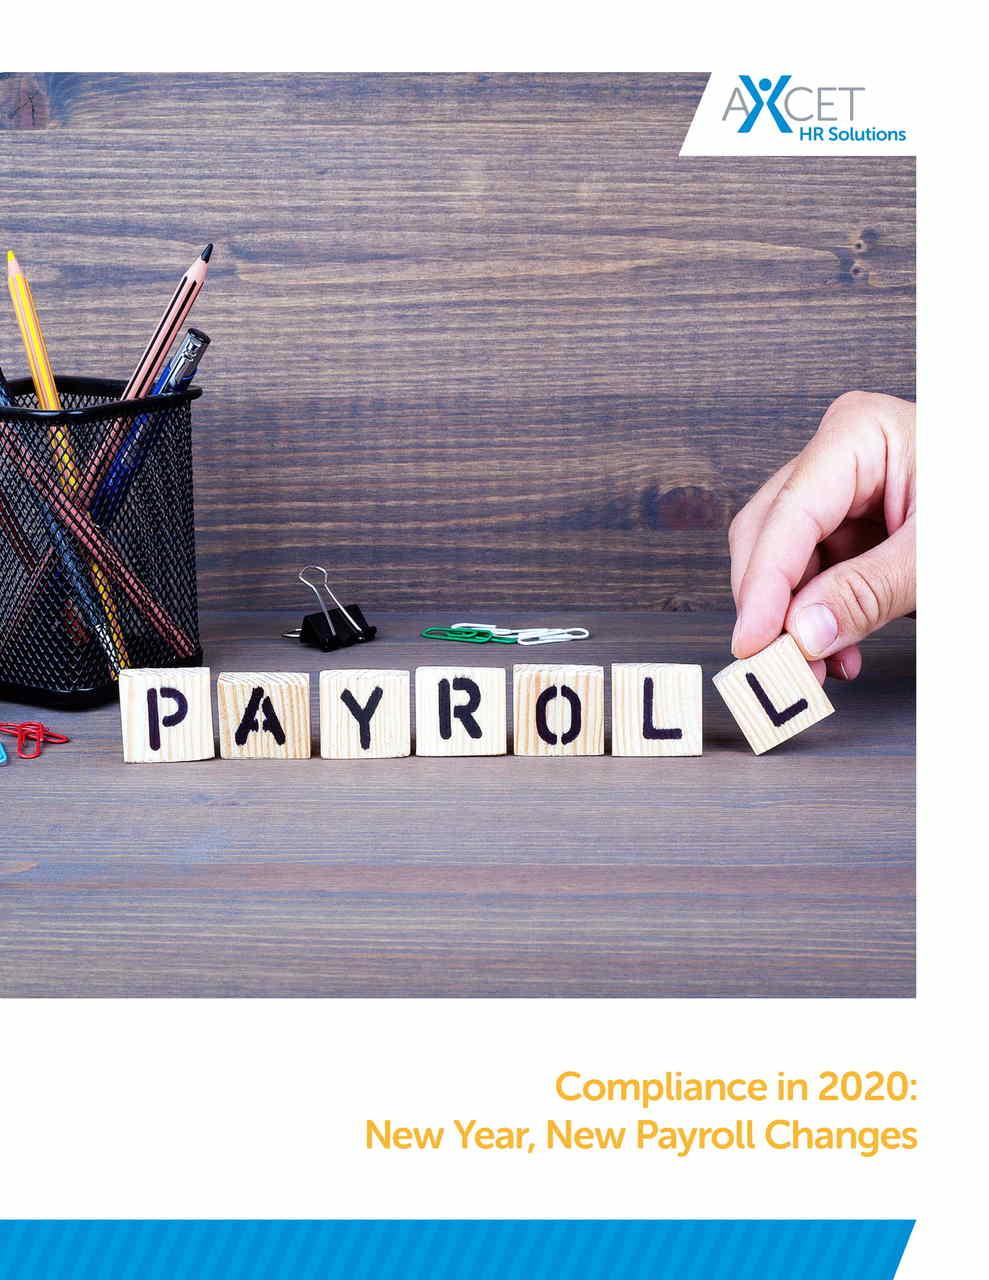 2020 Payroll Changes